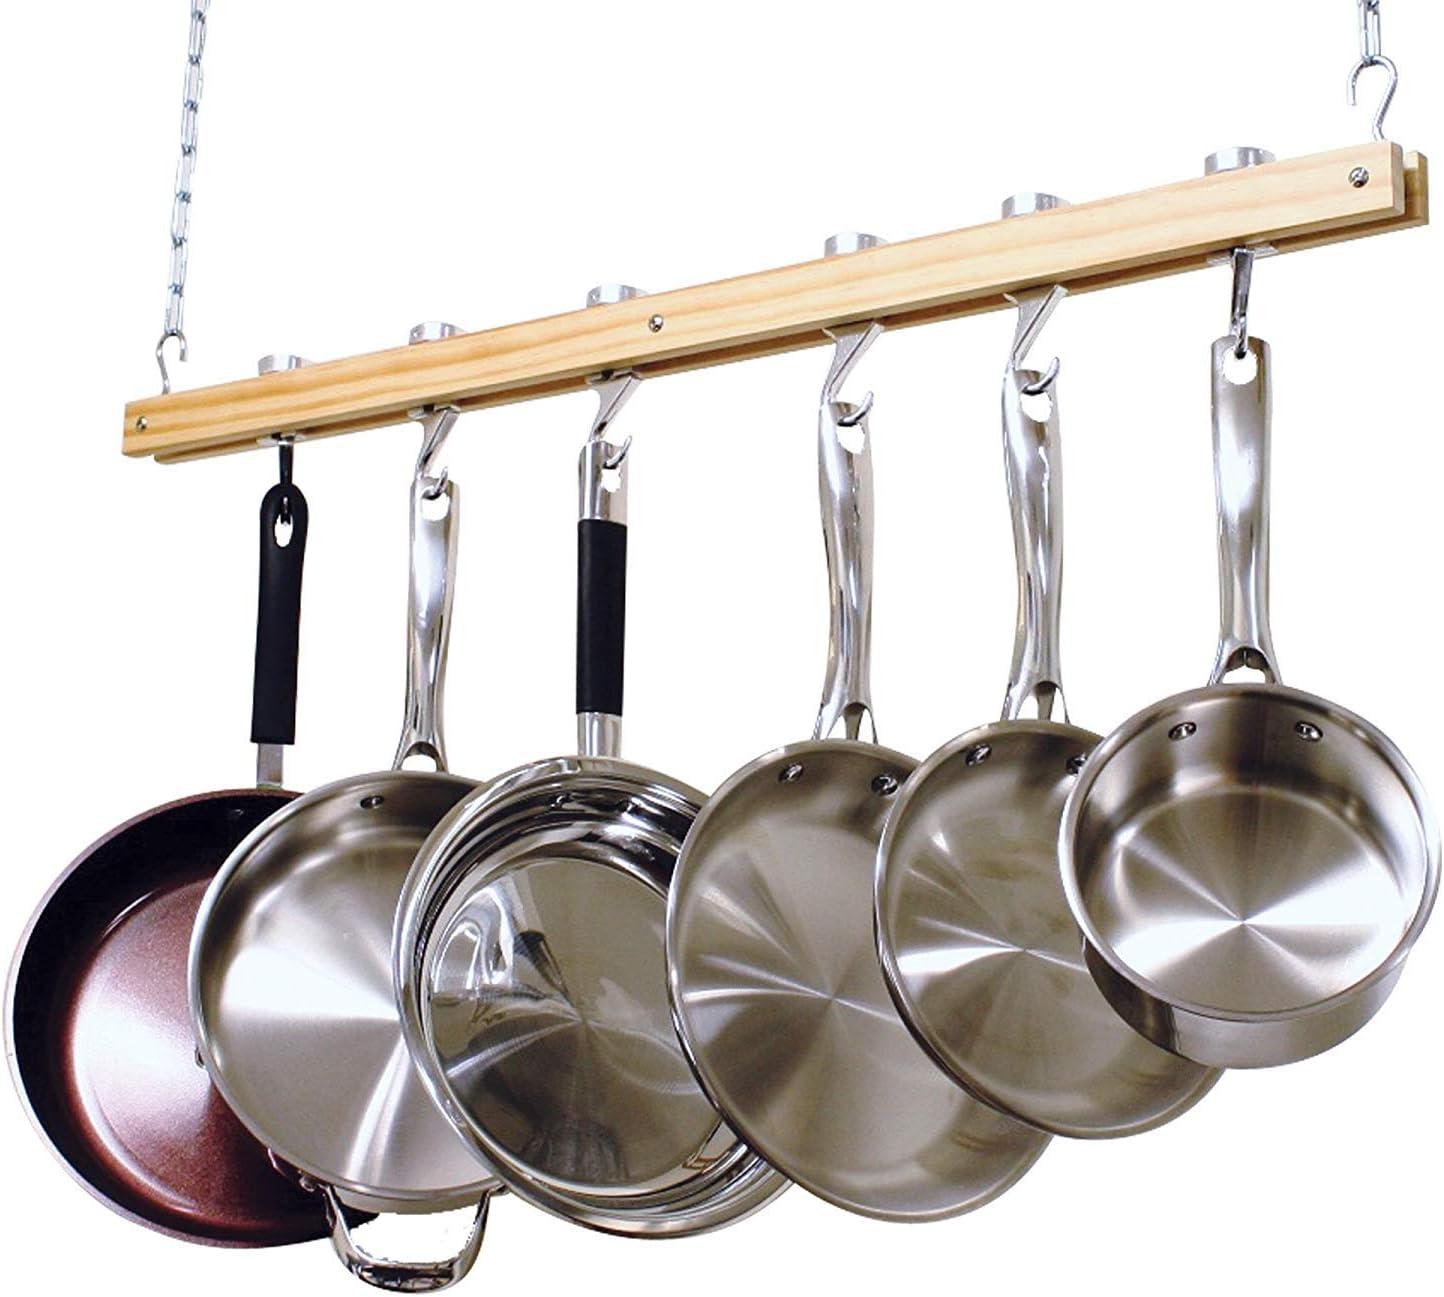 Cooks Standard, Single Bar, 36-Inch Ceiling Mounted Wooden Pot Rack, Brown: Kitchen Pot Racks: Kitchen & Dining